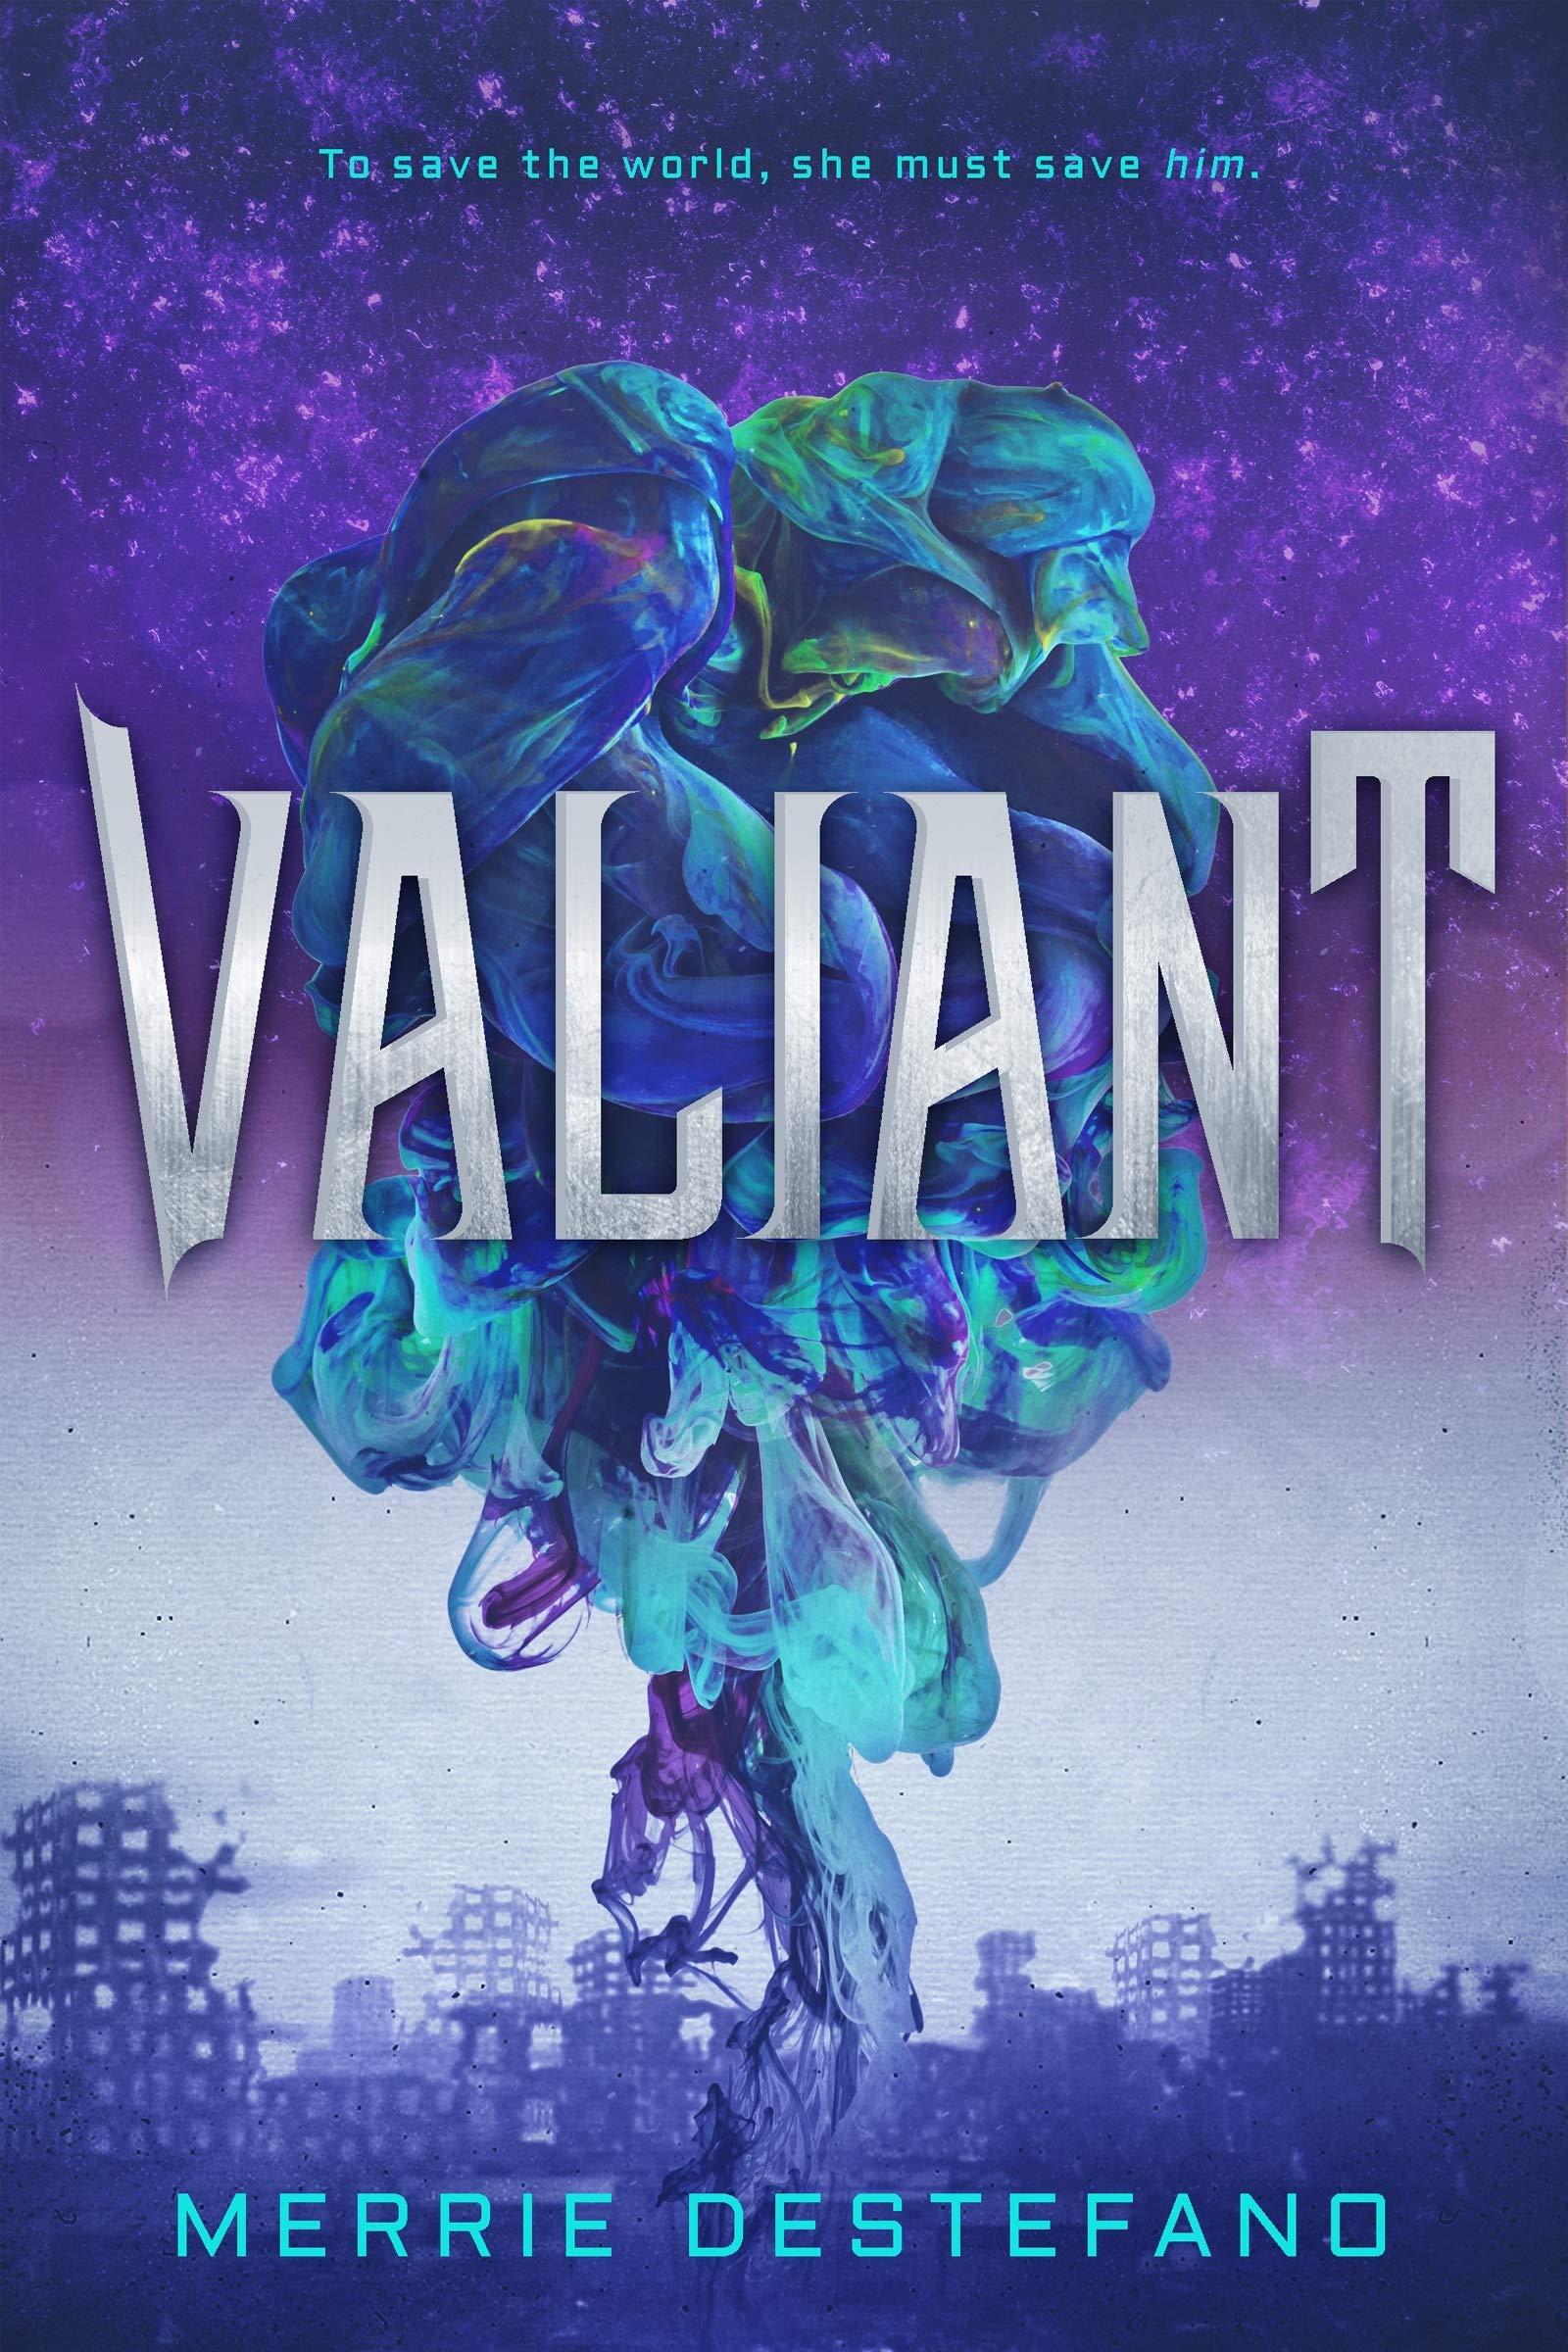 Amazon.com: Valiant (9781640634268): Destefano, Merrie: Books